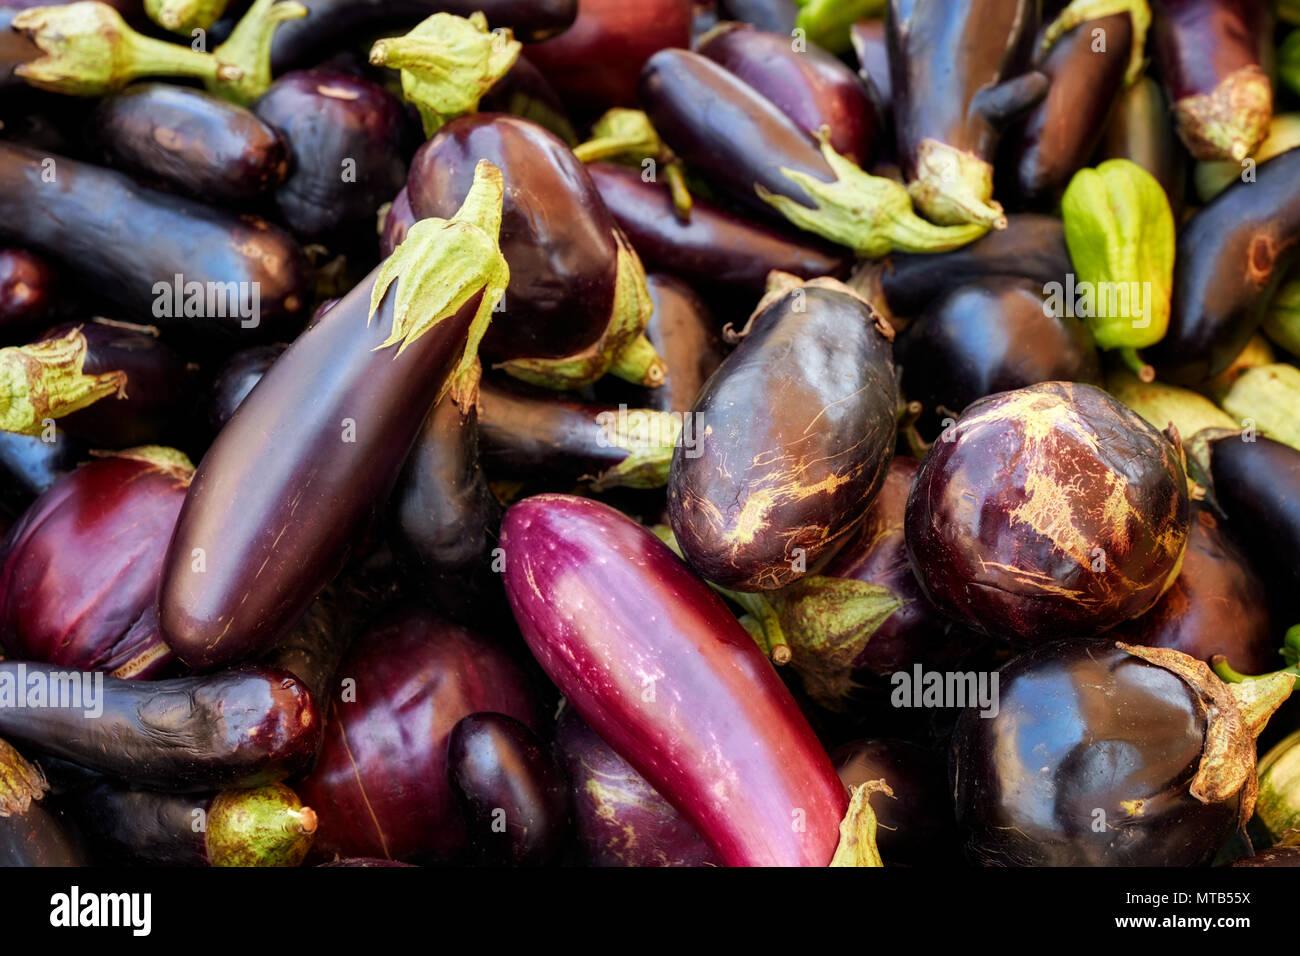 Heap of fresh Eggplants on a market counter - Stock Image